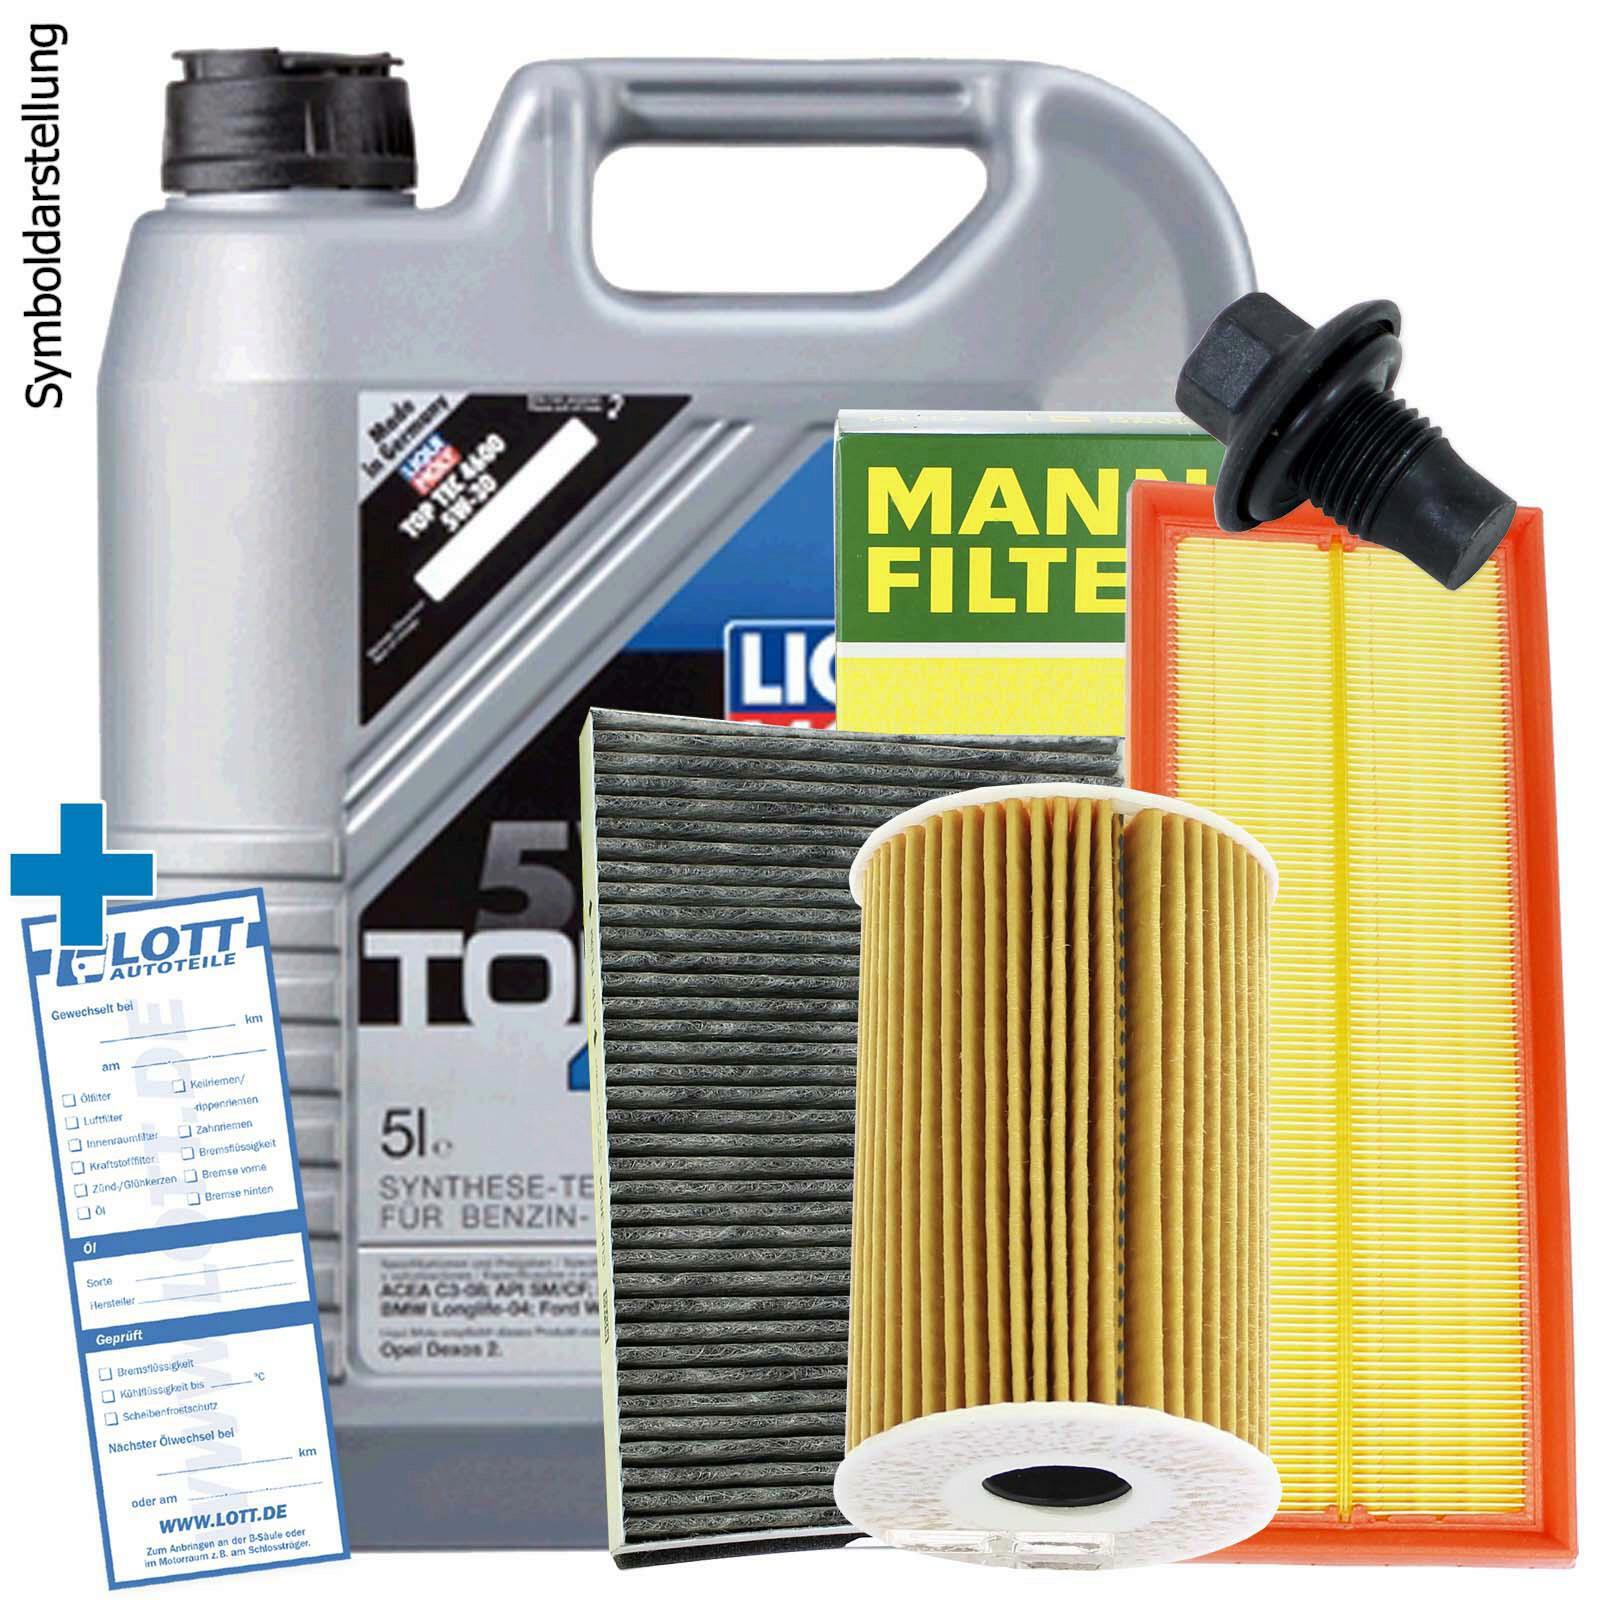 Liqui Moly Motoröl + Ölfilter + Luftfilter + Innenraumfilter + Ablassschraube